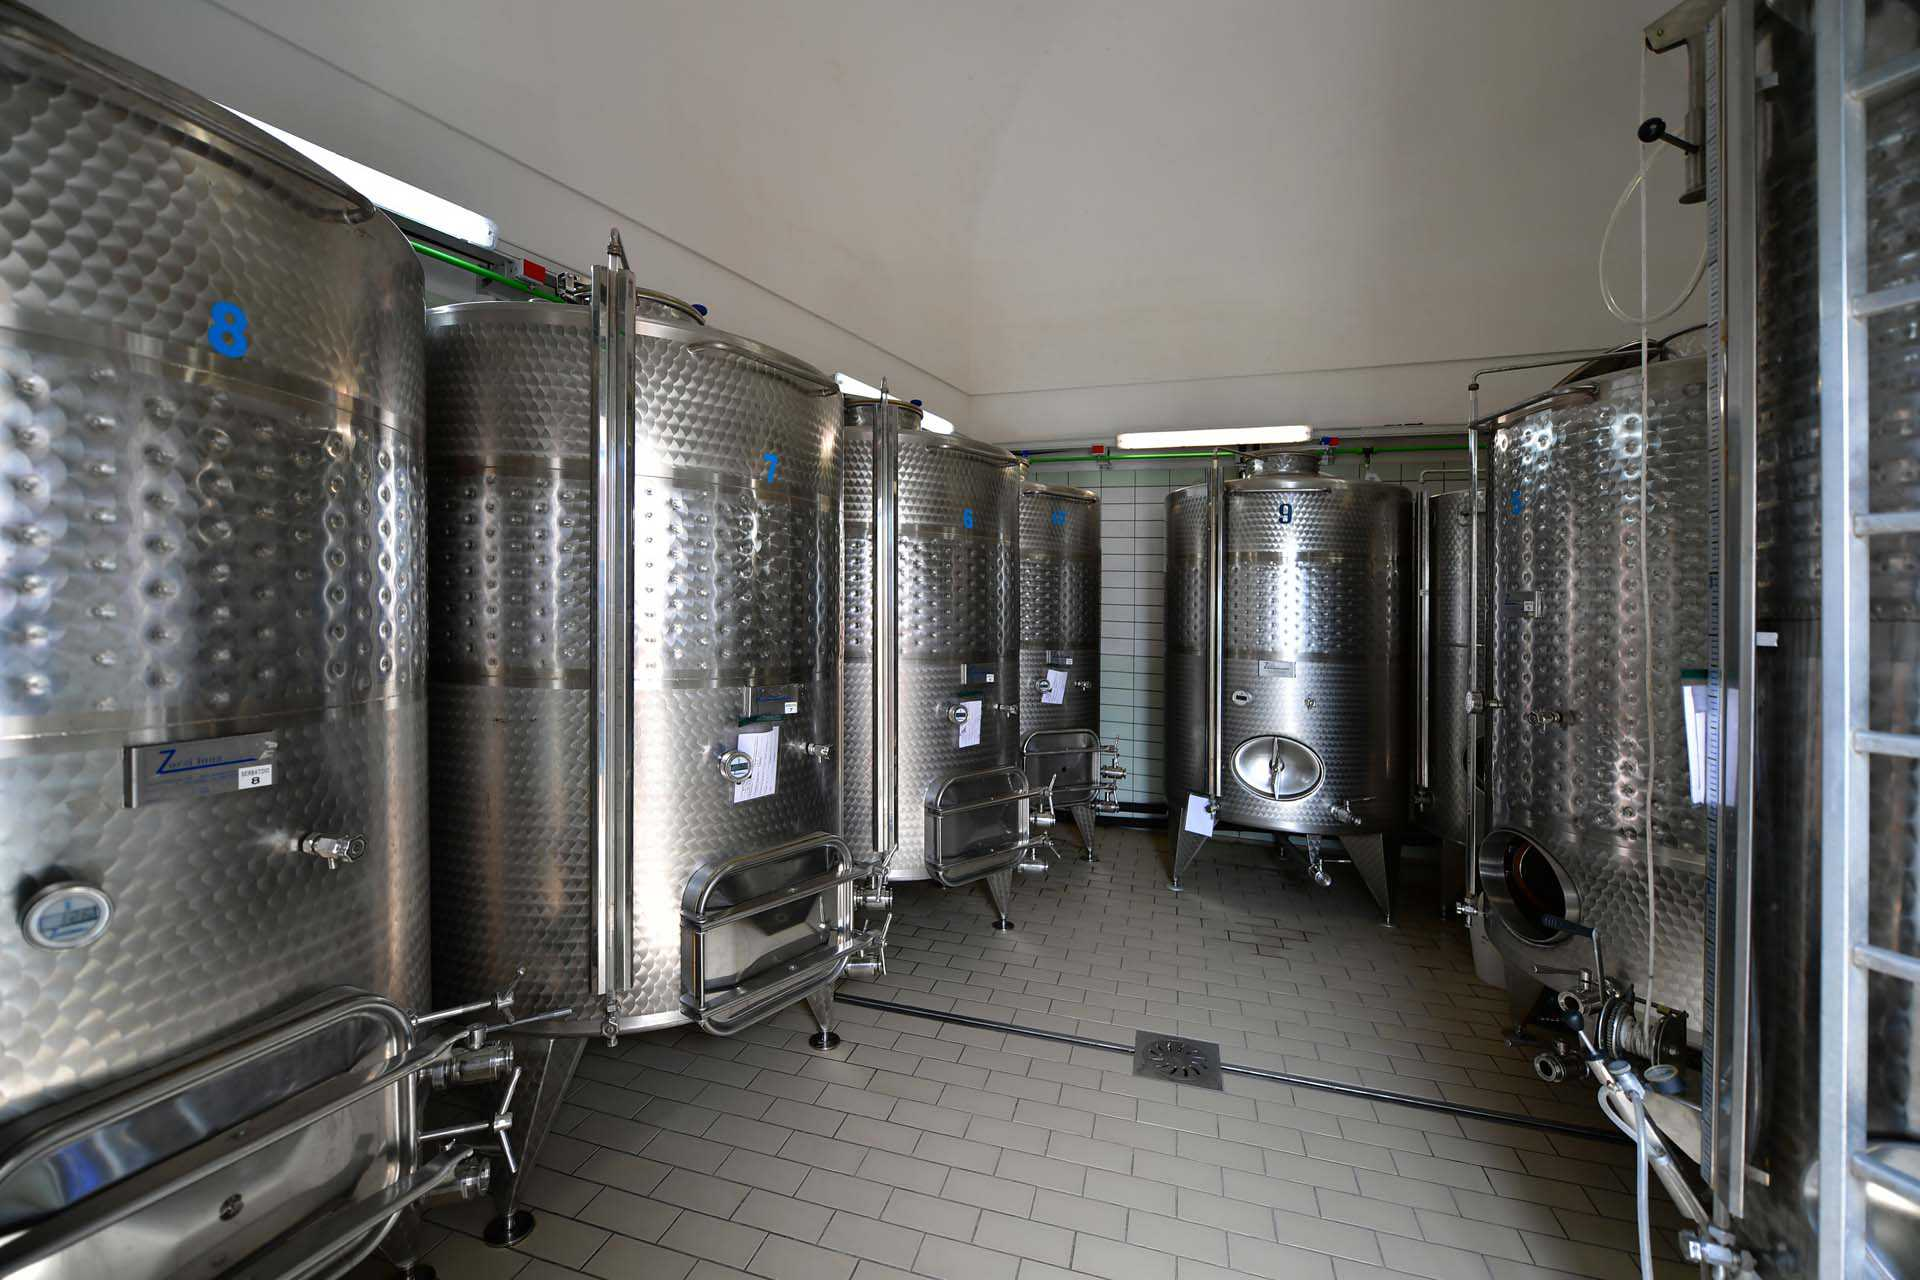 AMALFI COAST, 10 Bedrooms Bedrooms, ,9 BathroomsBathrooms,Vineyards,For sale,AMALFI COAST,1010015973 MLS # 1010015973